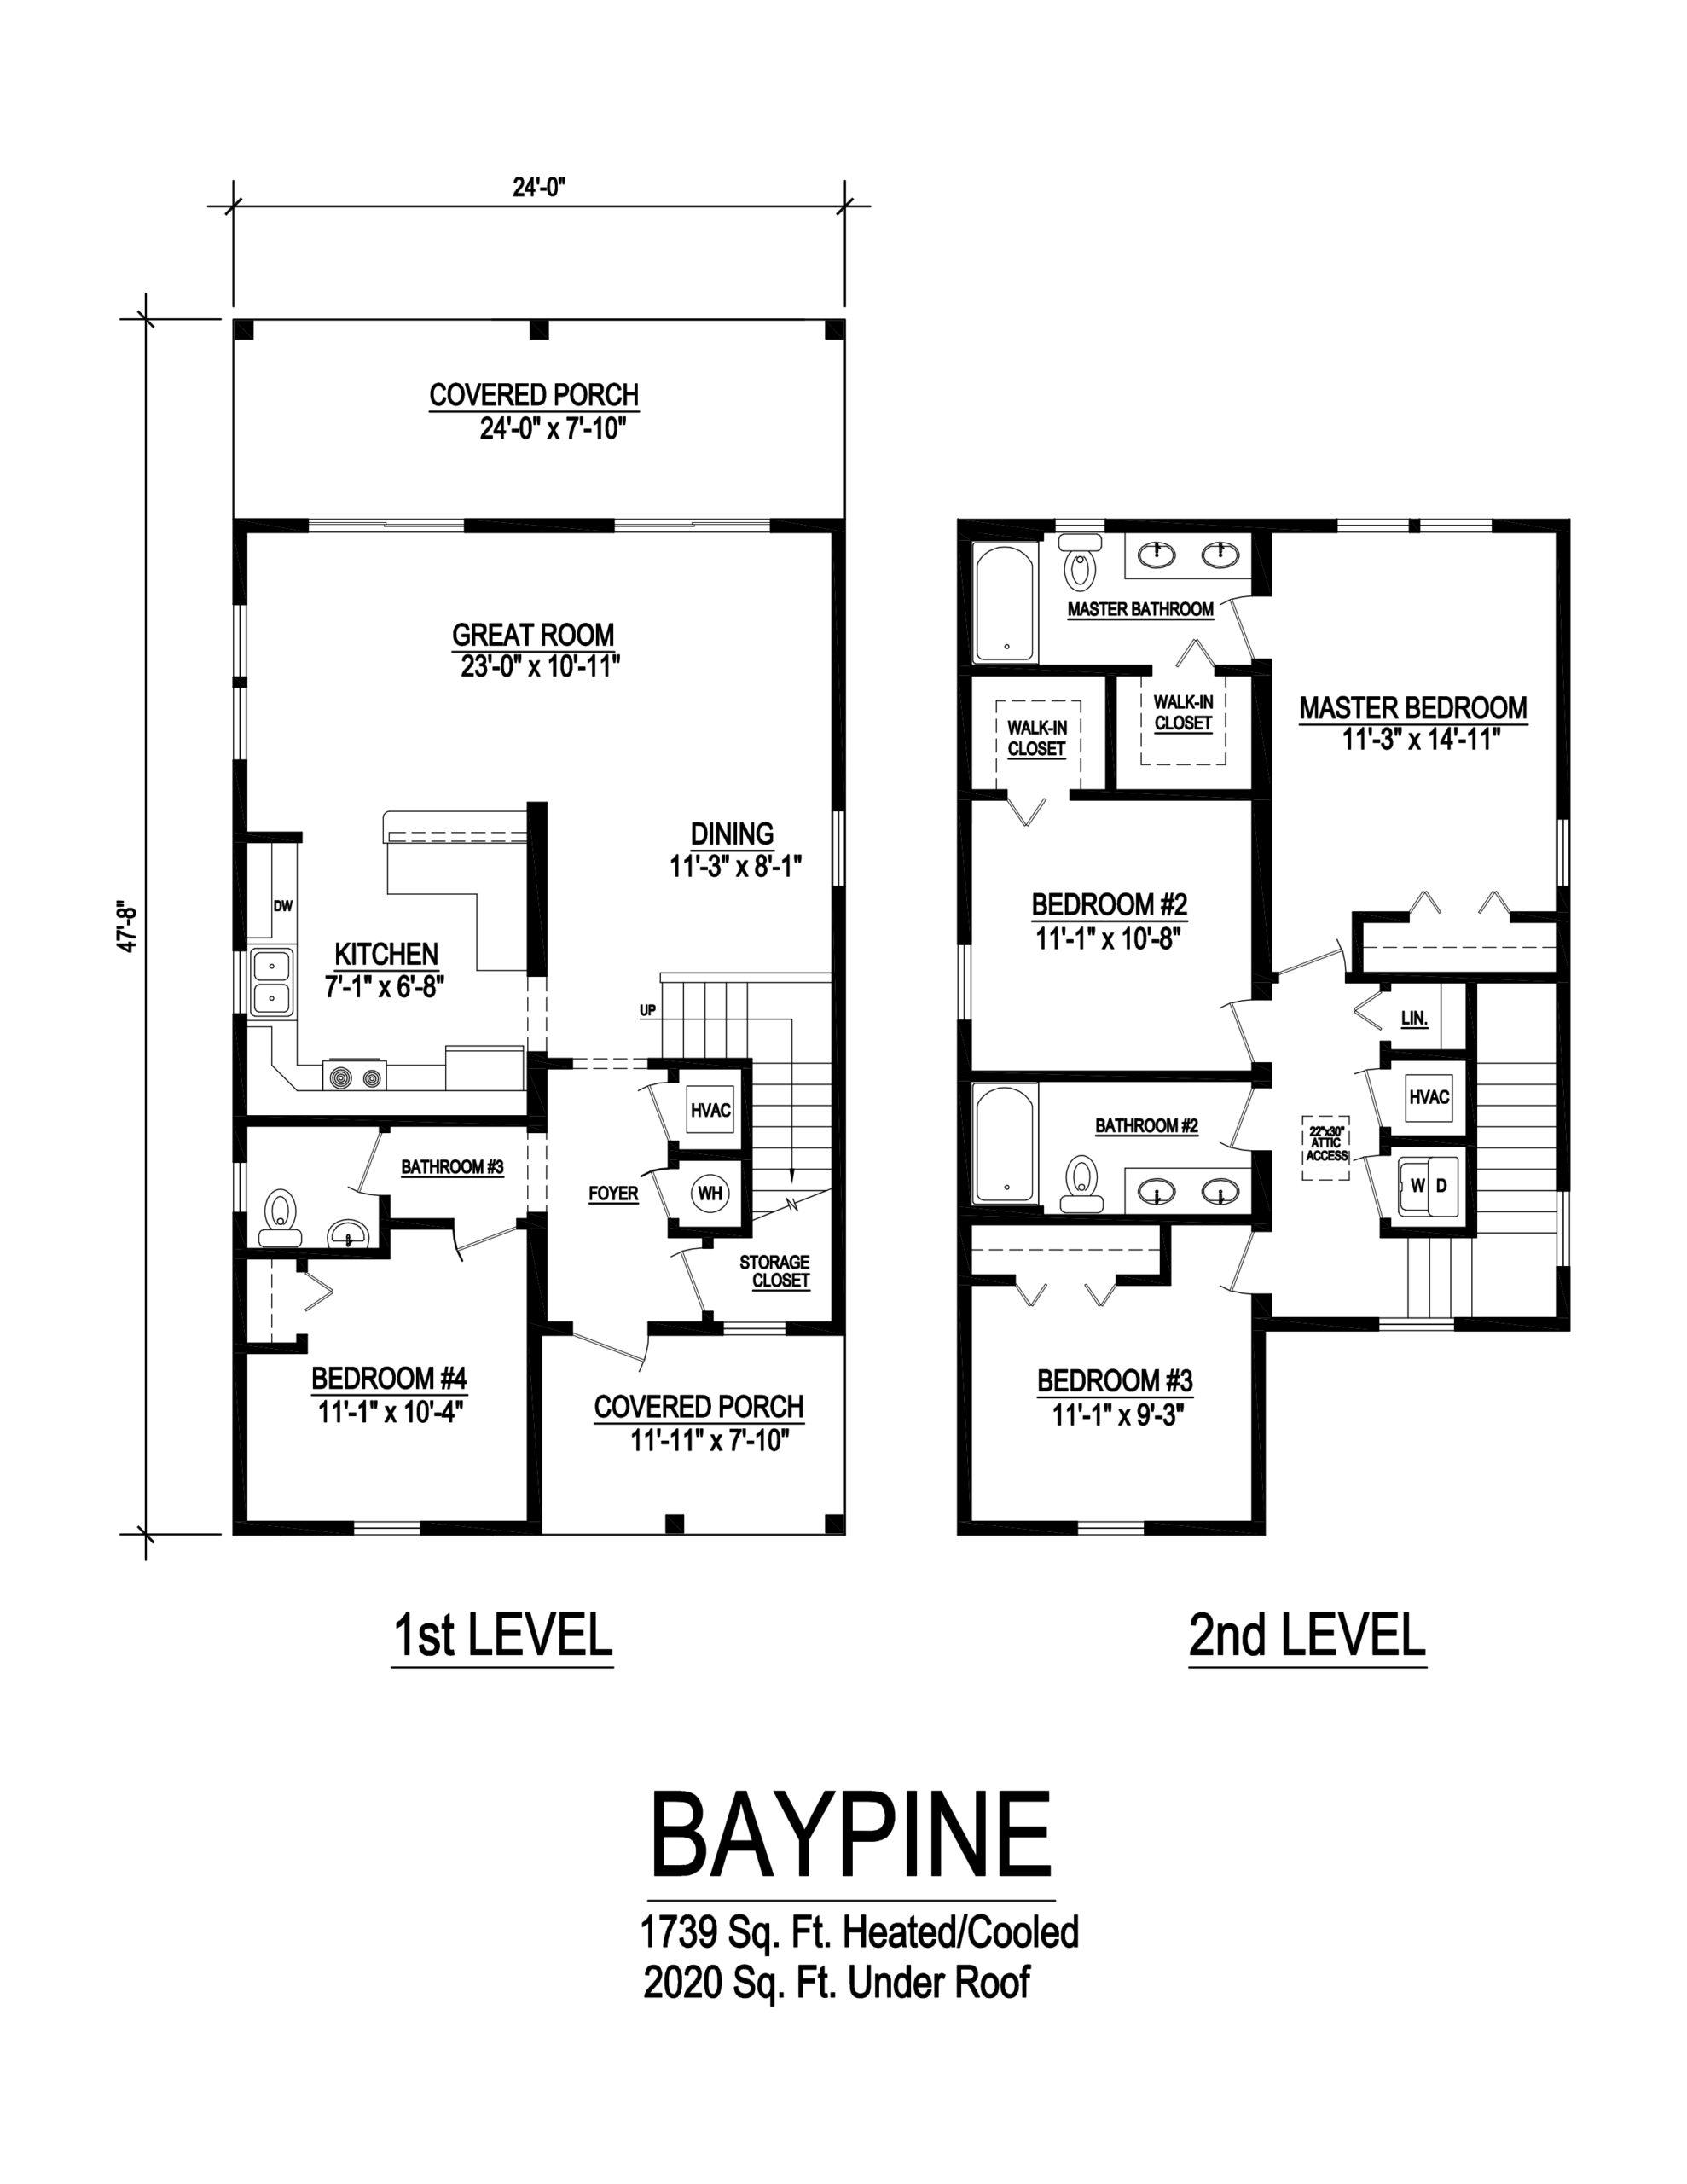 baypine modular home floorplan